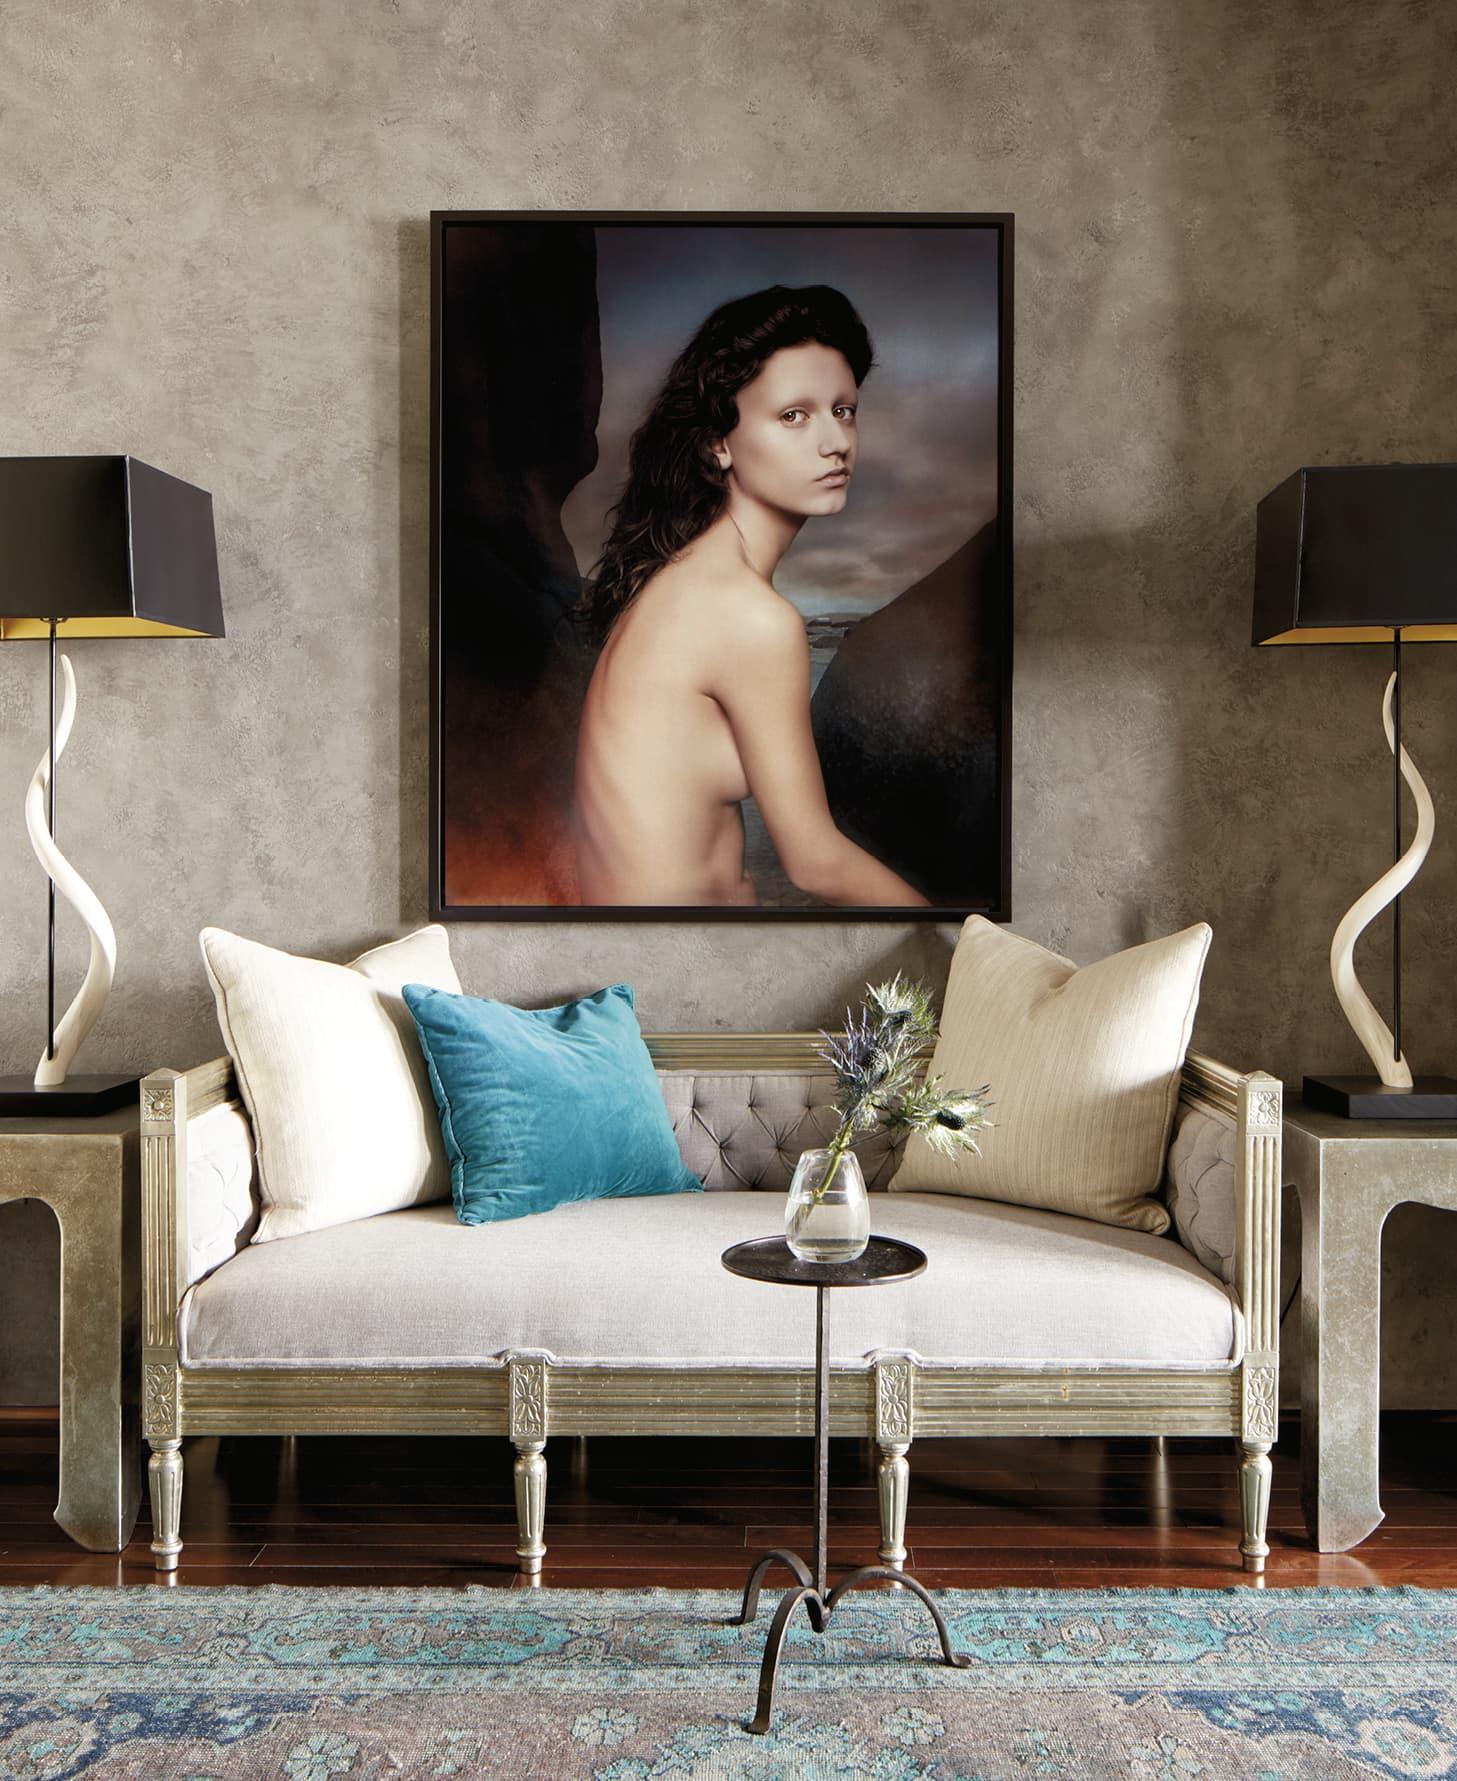 Arty portrait over a sofa